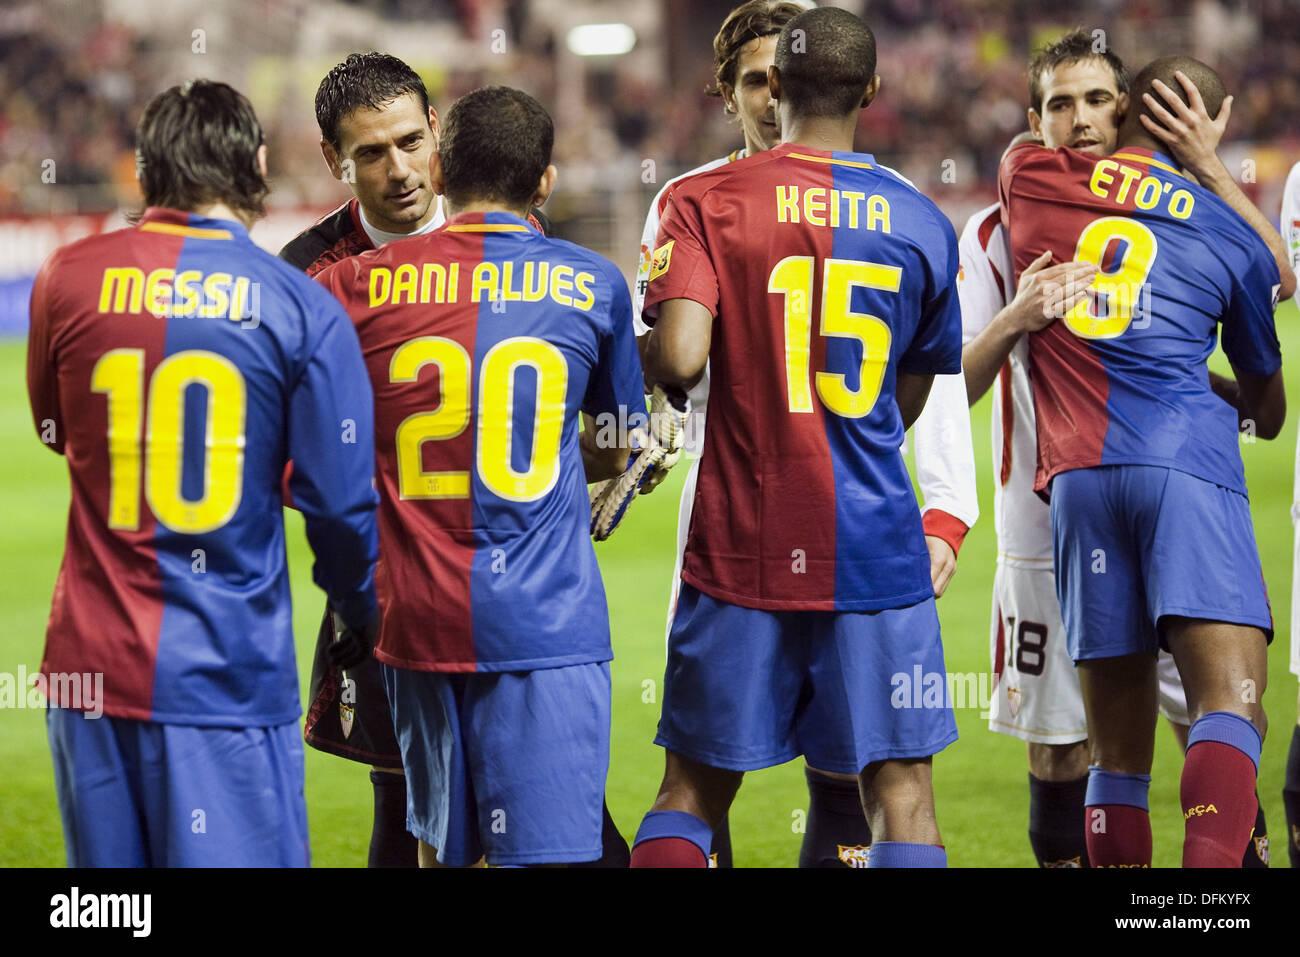 00af000ed51 Spanish League 2008-09 (november 29, 2008): Sevilla FC vs. FC Barcelona.  Estadio Ramón Sánchez Pizjuán. Players greet each